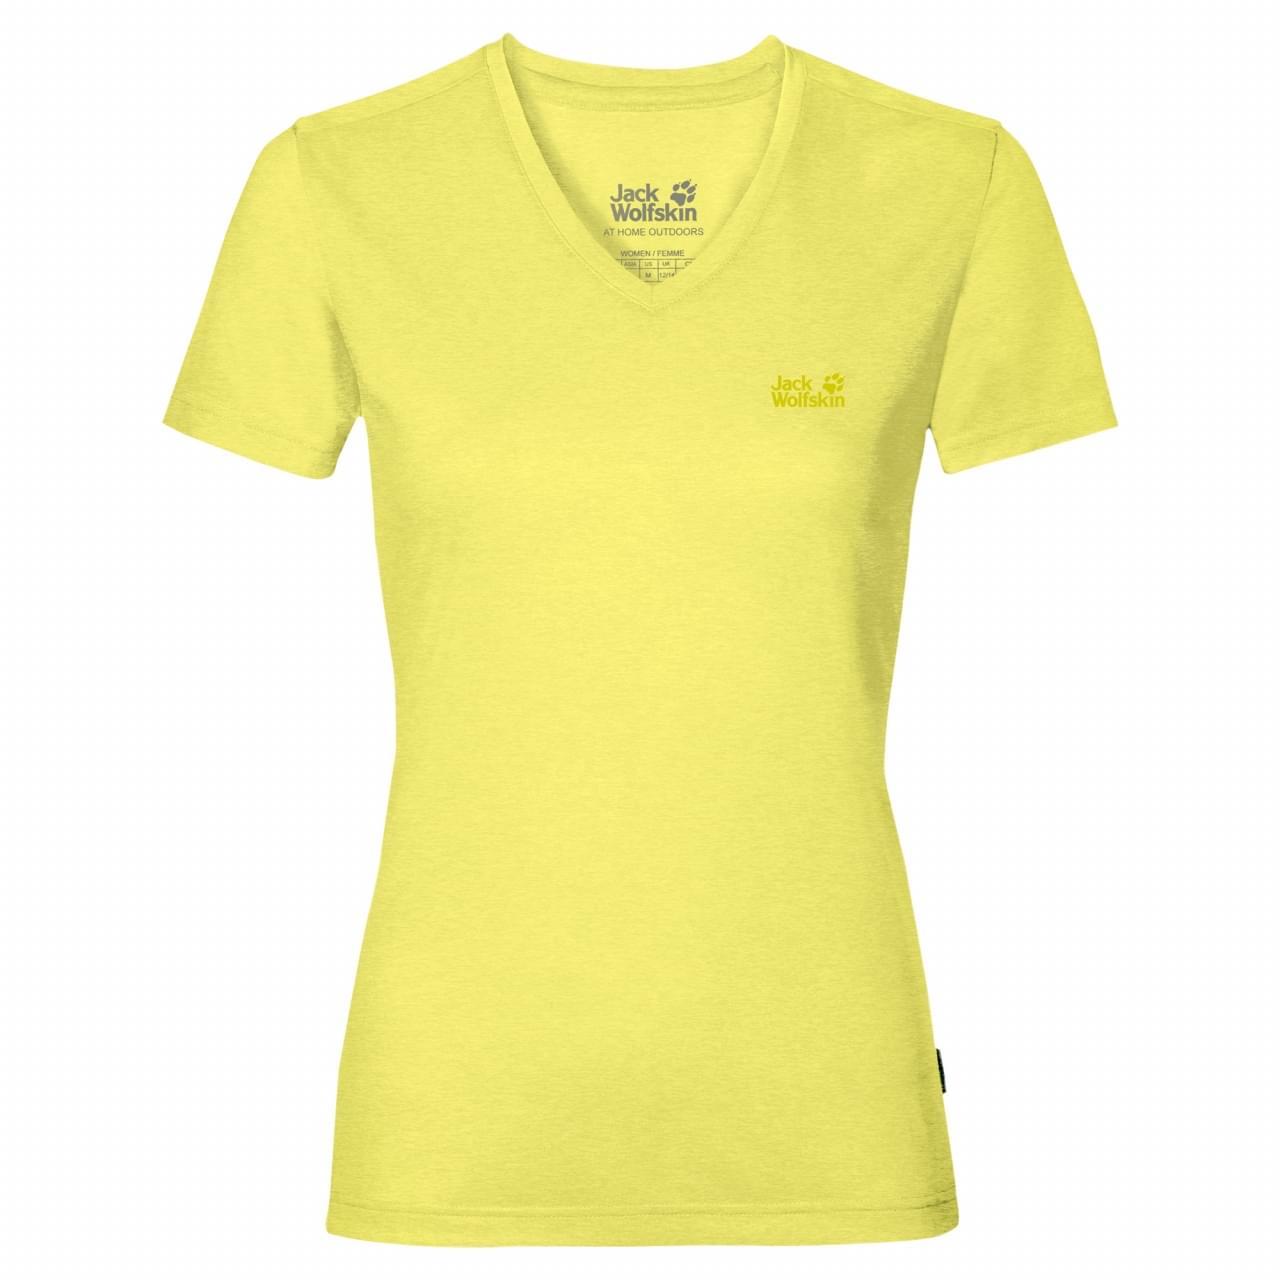 Jack Wolfskin Crosstrail T-shirt Dames Geel